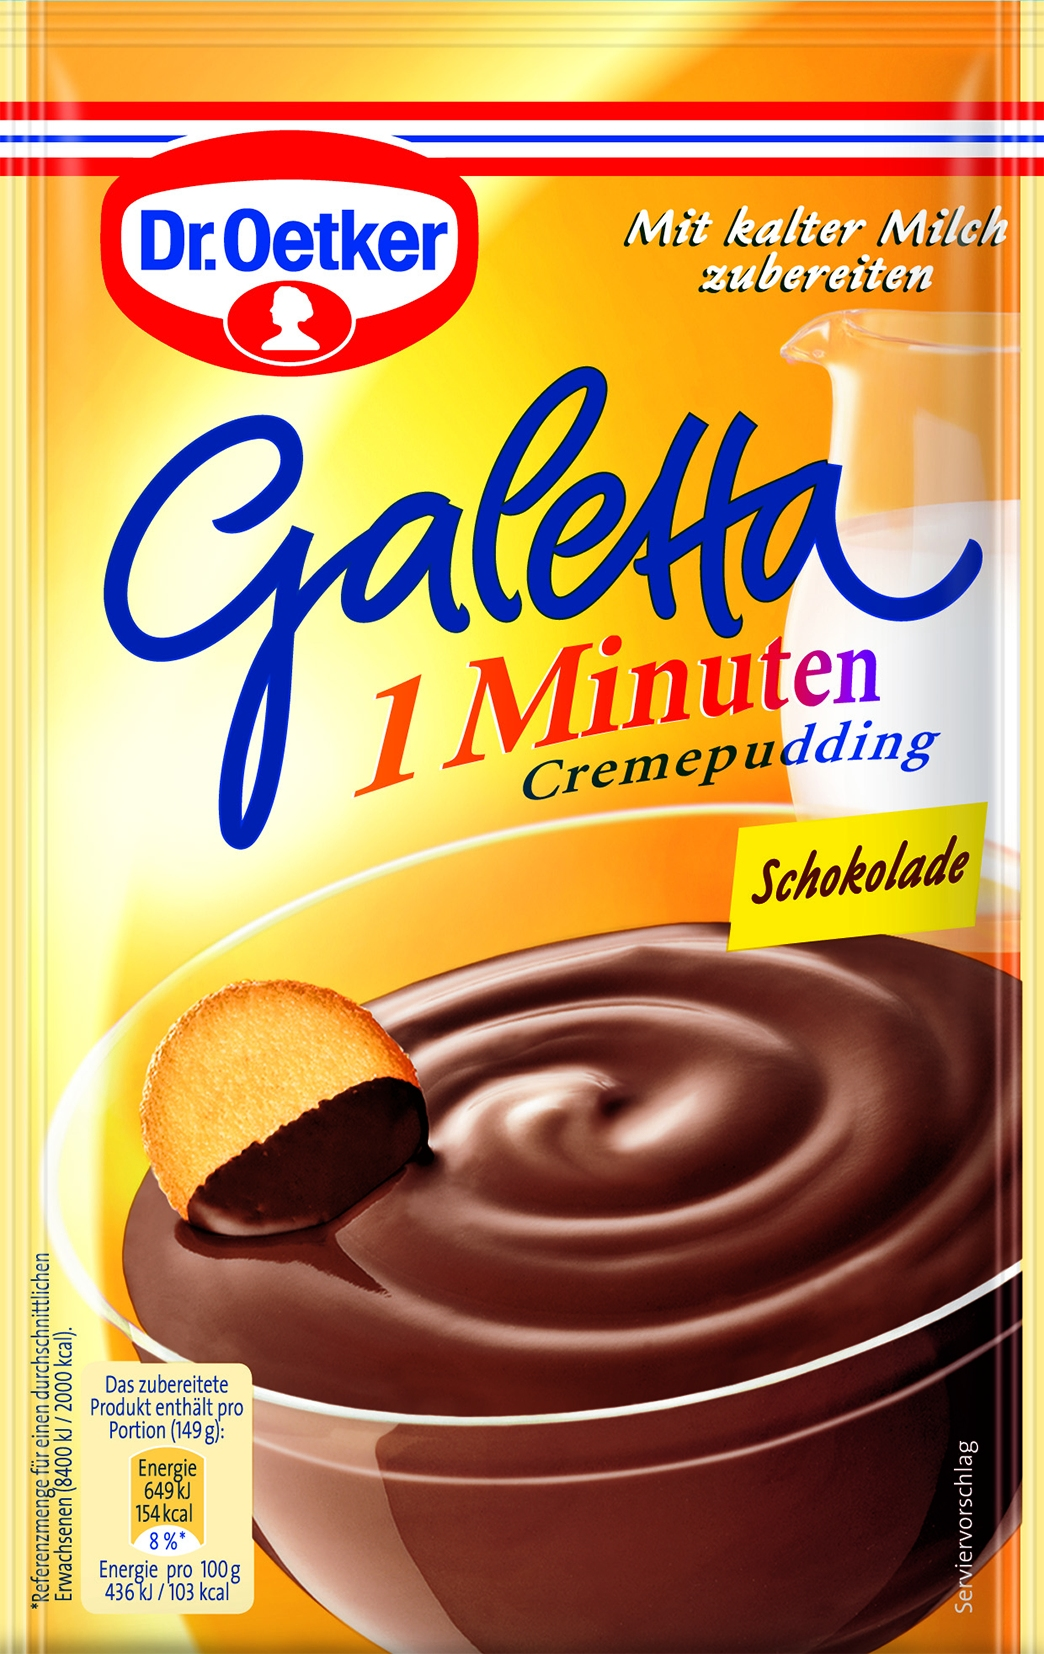 Galetta Schokolade 1 Minute